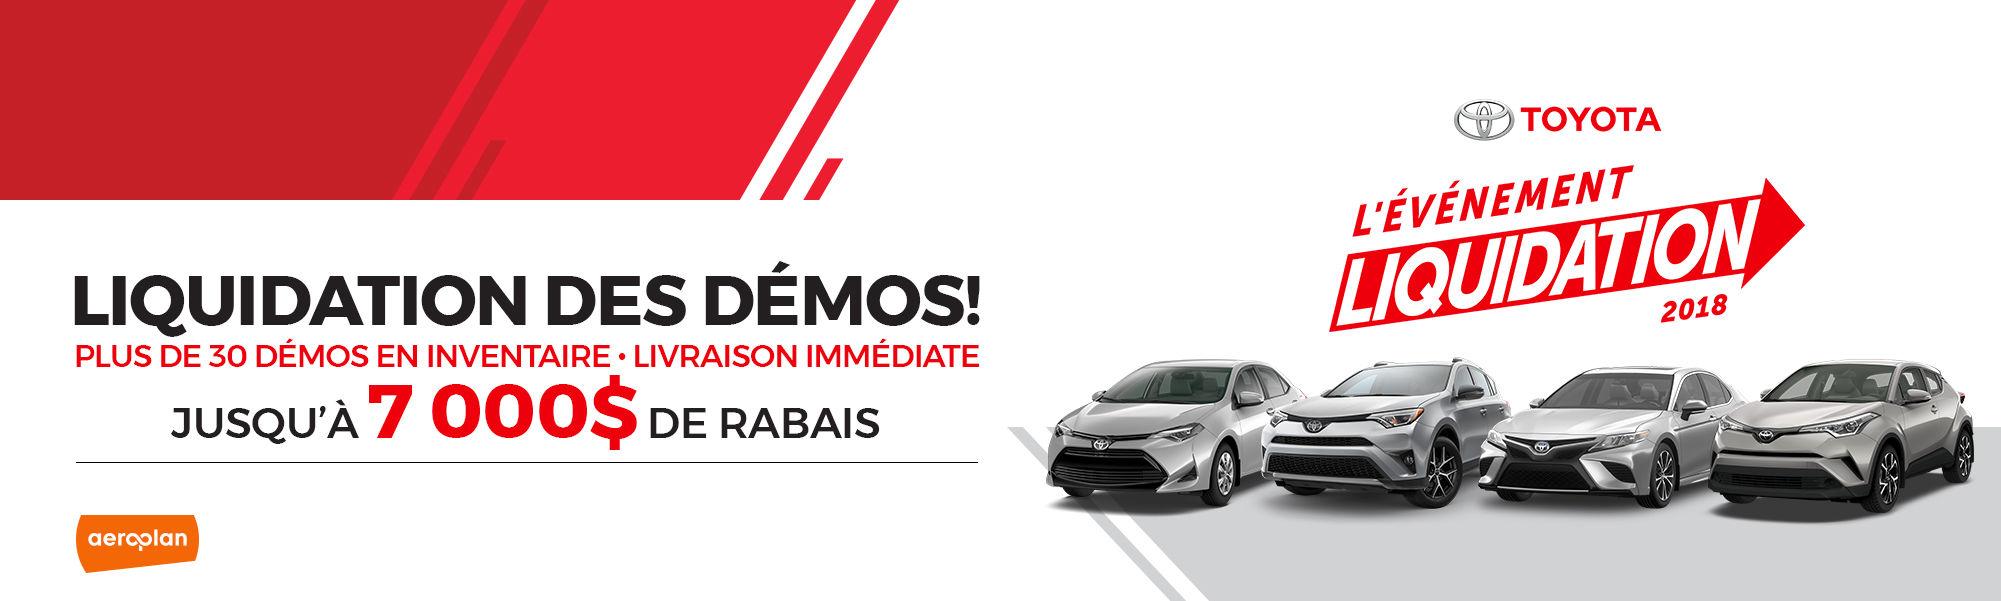 LIQUIDATION DES DÉMOS!